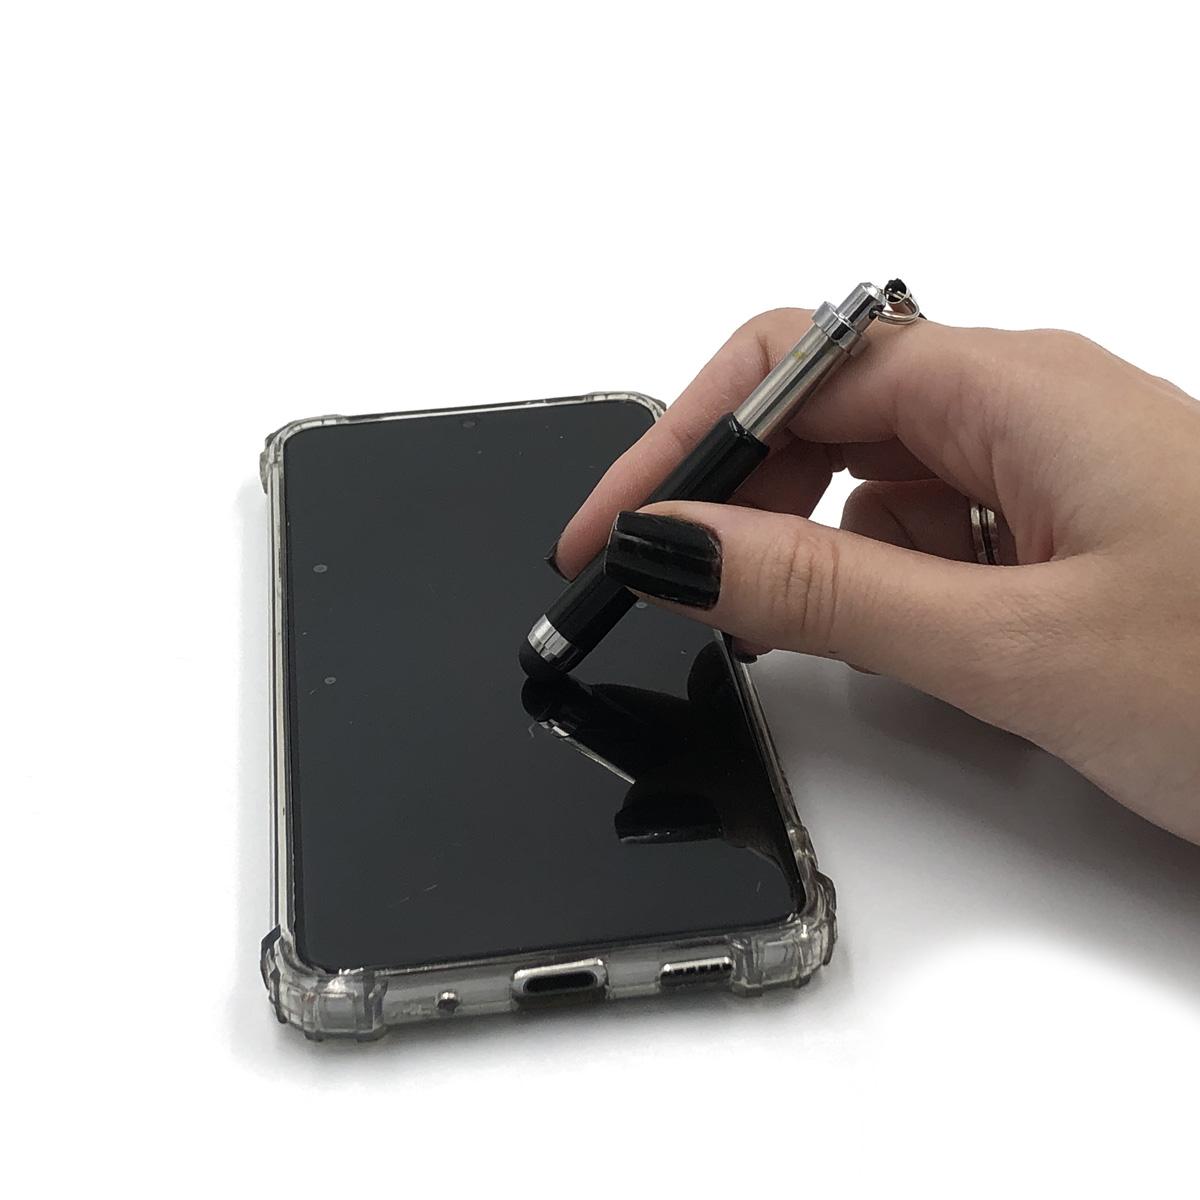 Mini Caneta Touch Screen para Smartphone Preta Tablet Universal